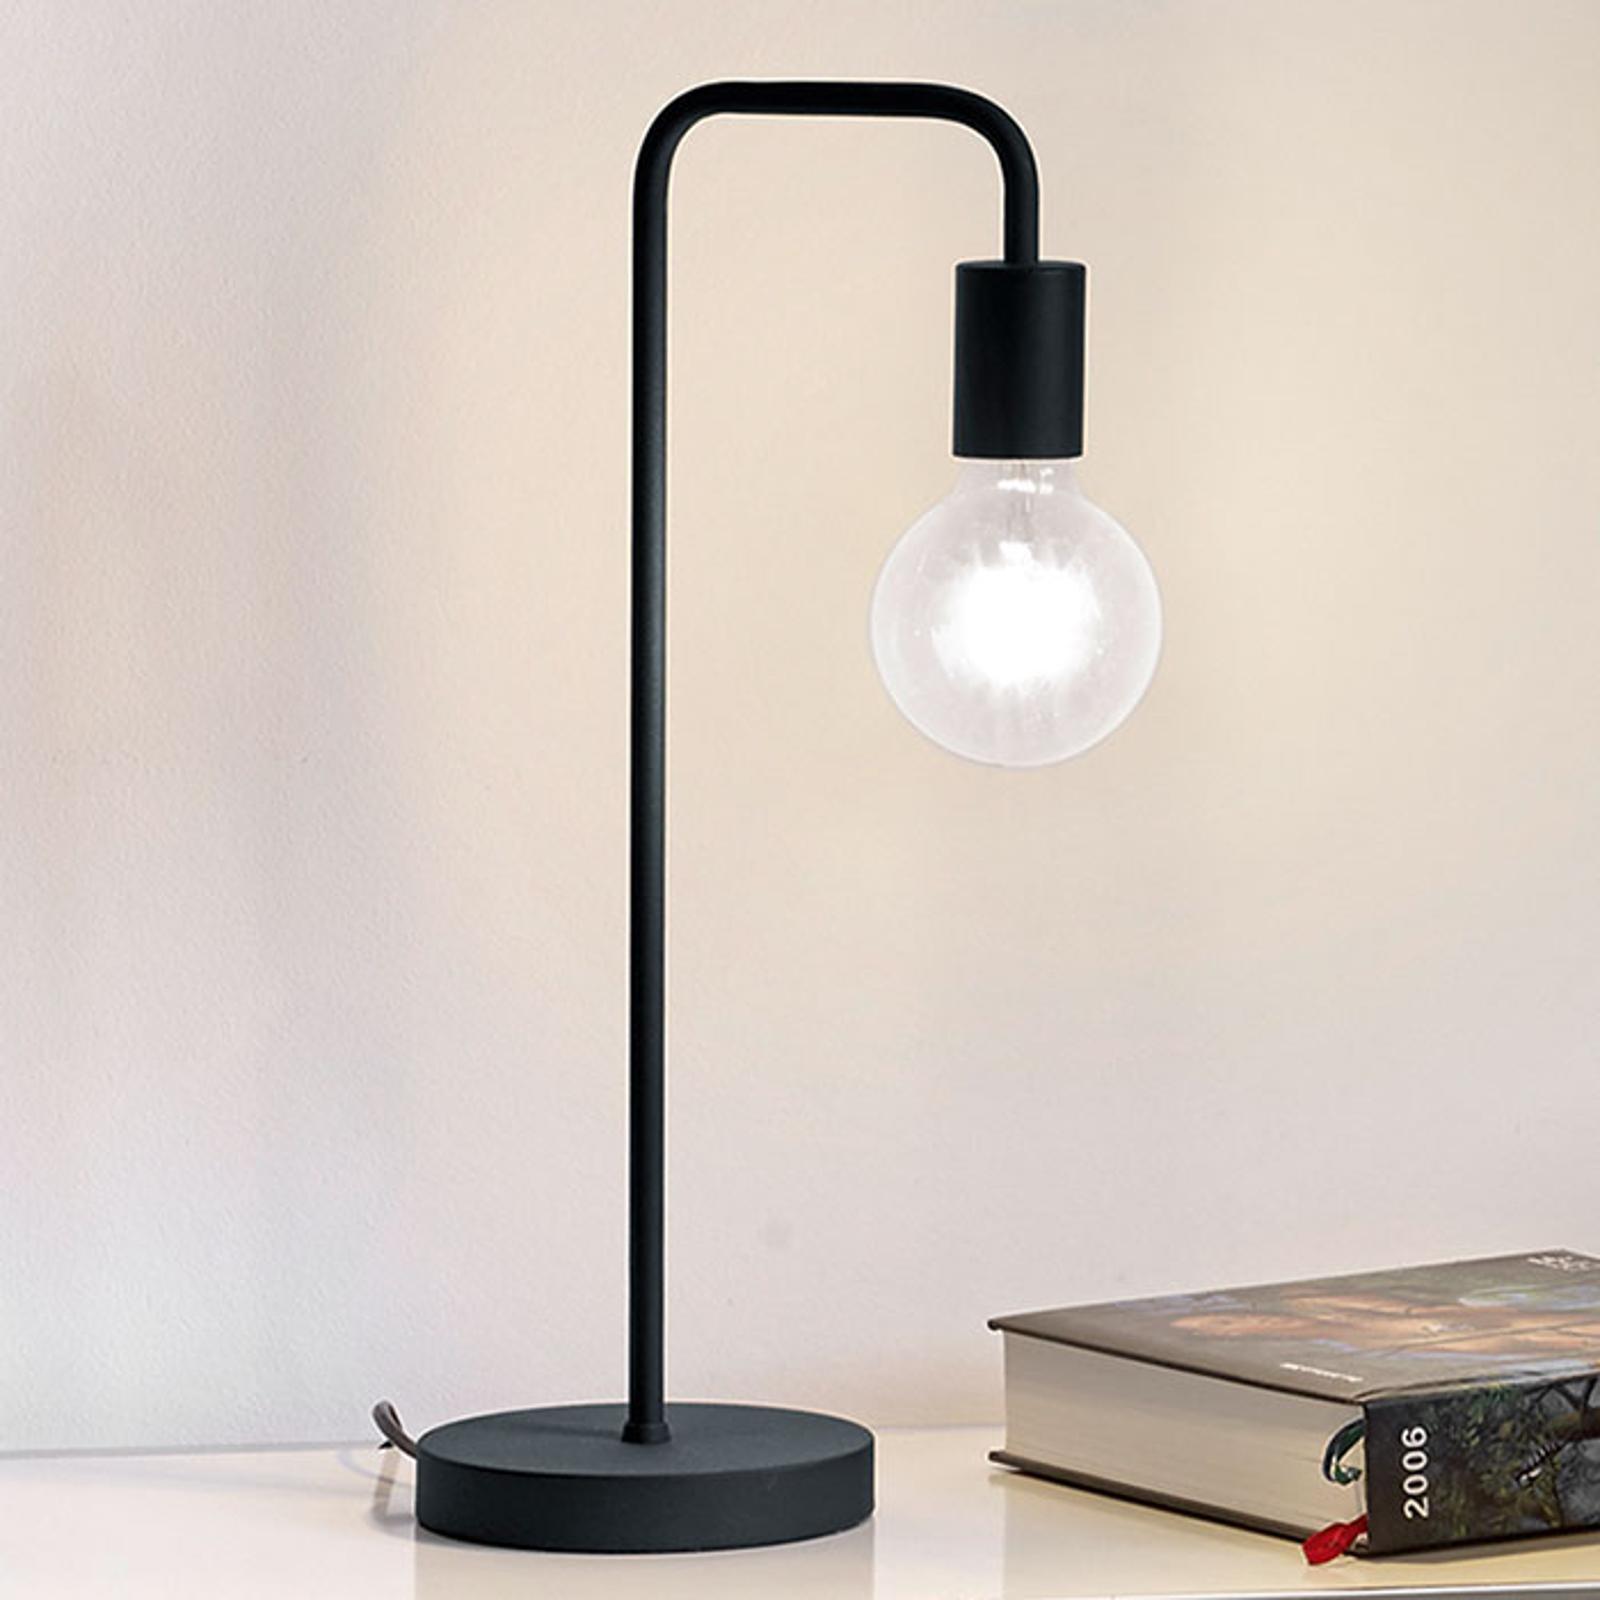 Tafellamp Diallo zonder kap in mat zwart